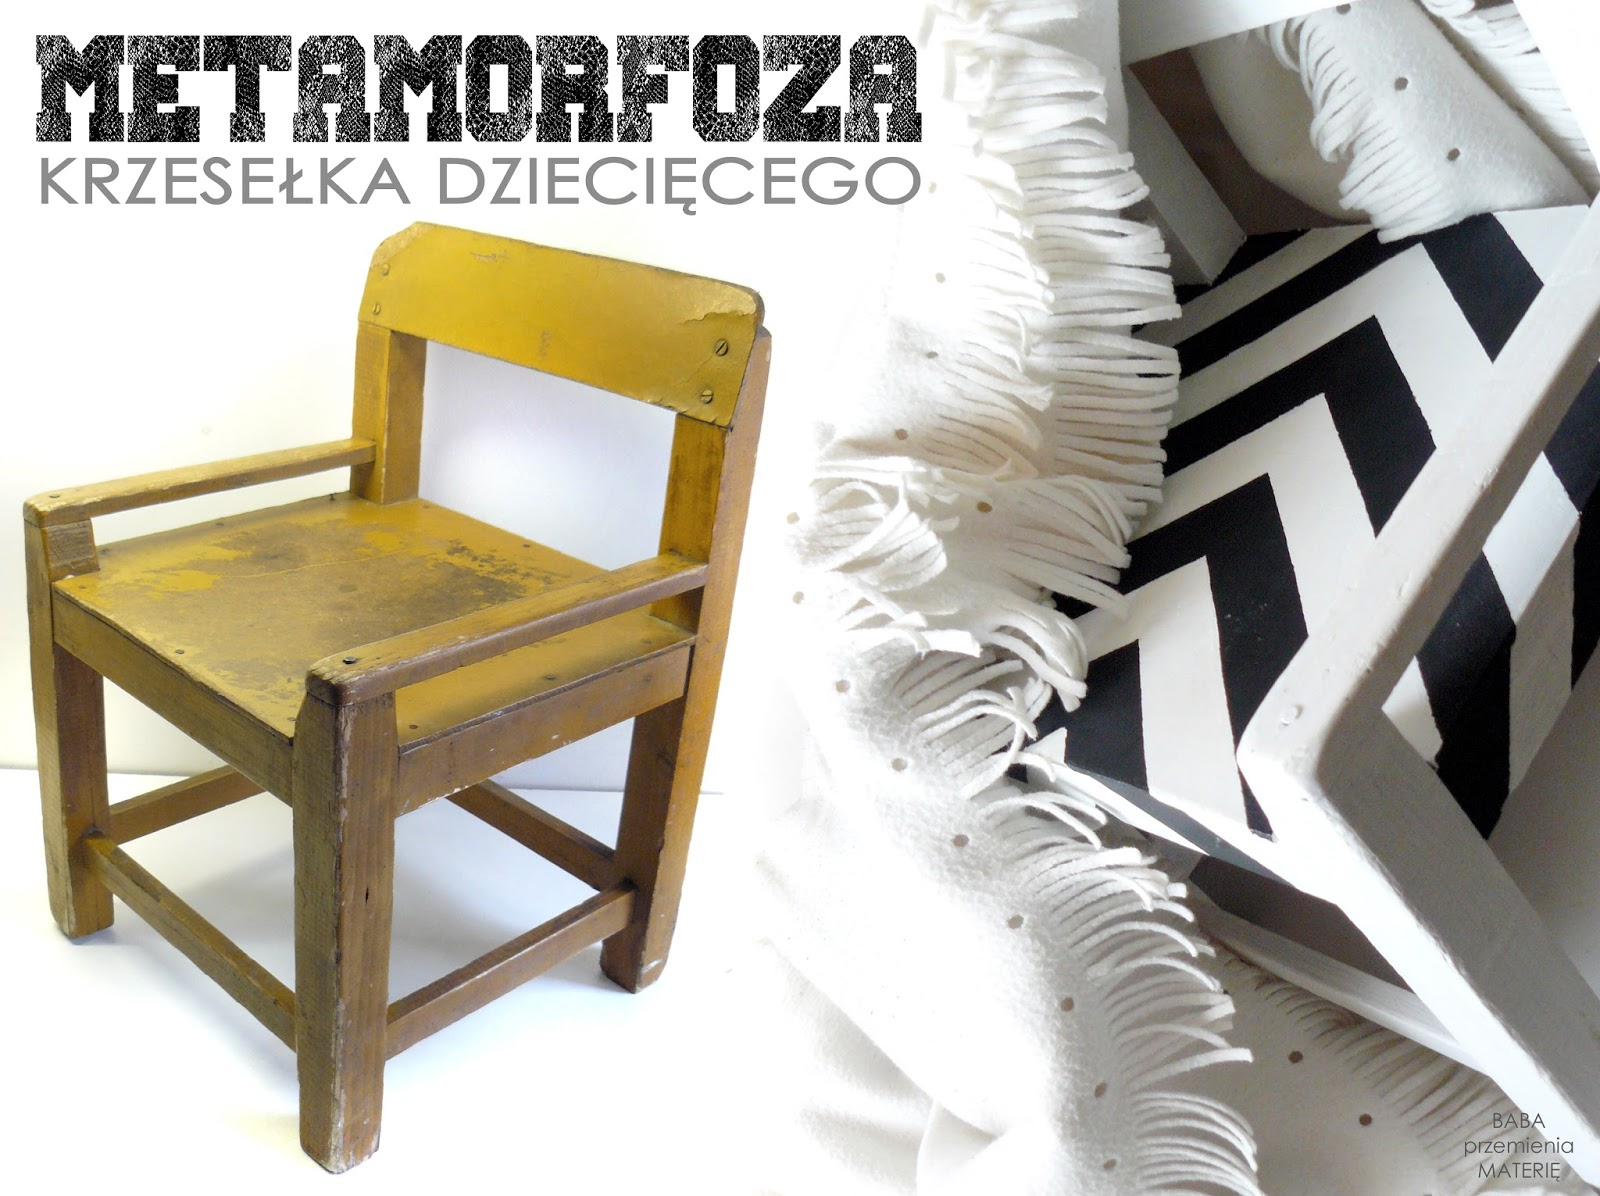 http://babaprzemieniamaterie.blogspot.com/2016/03/prosta-metamorfoza-drewnianego-krzeseka.html#more